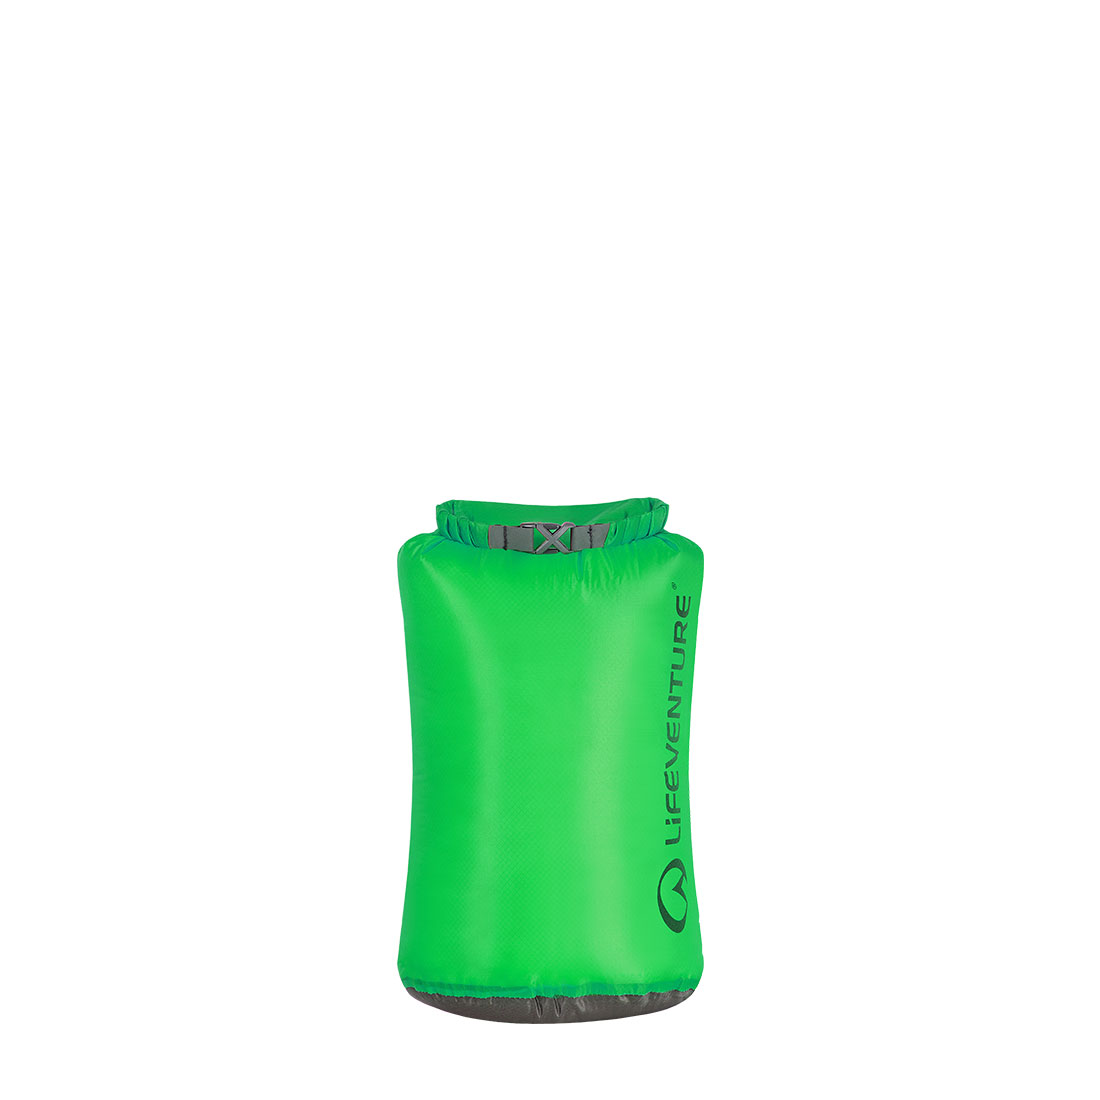 59630-ultralite-dry-bag-10l-1